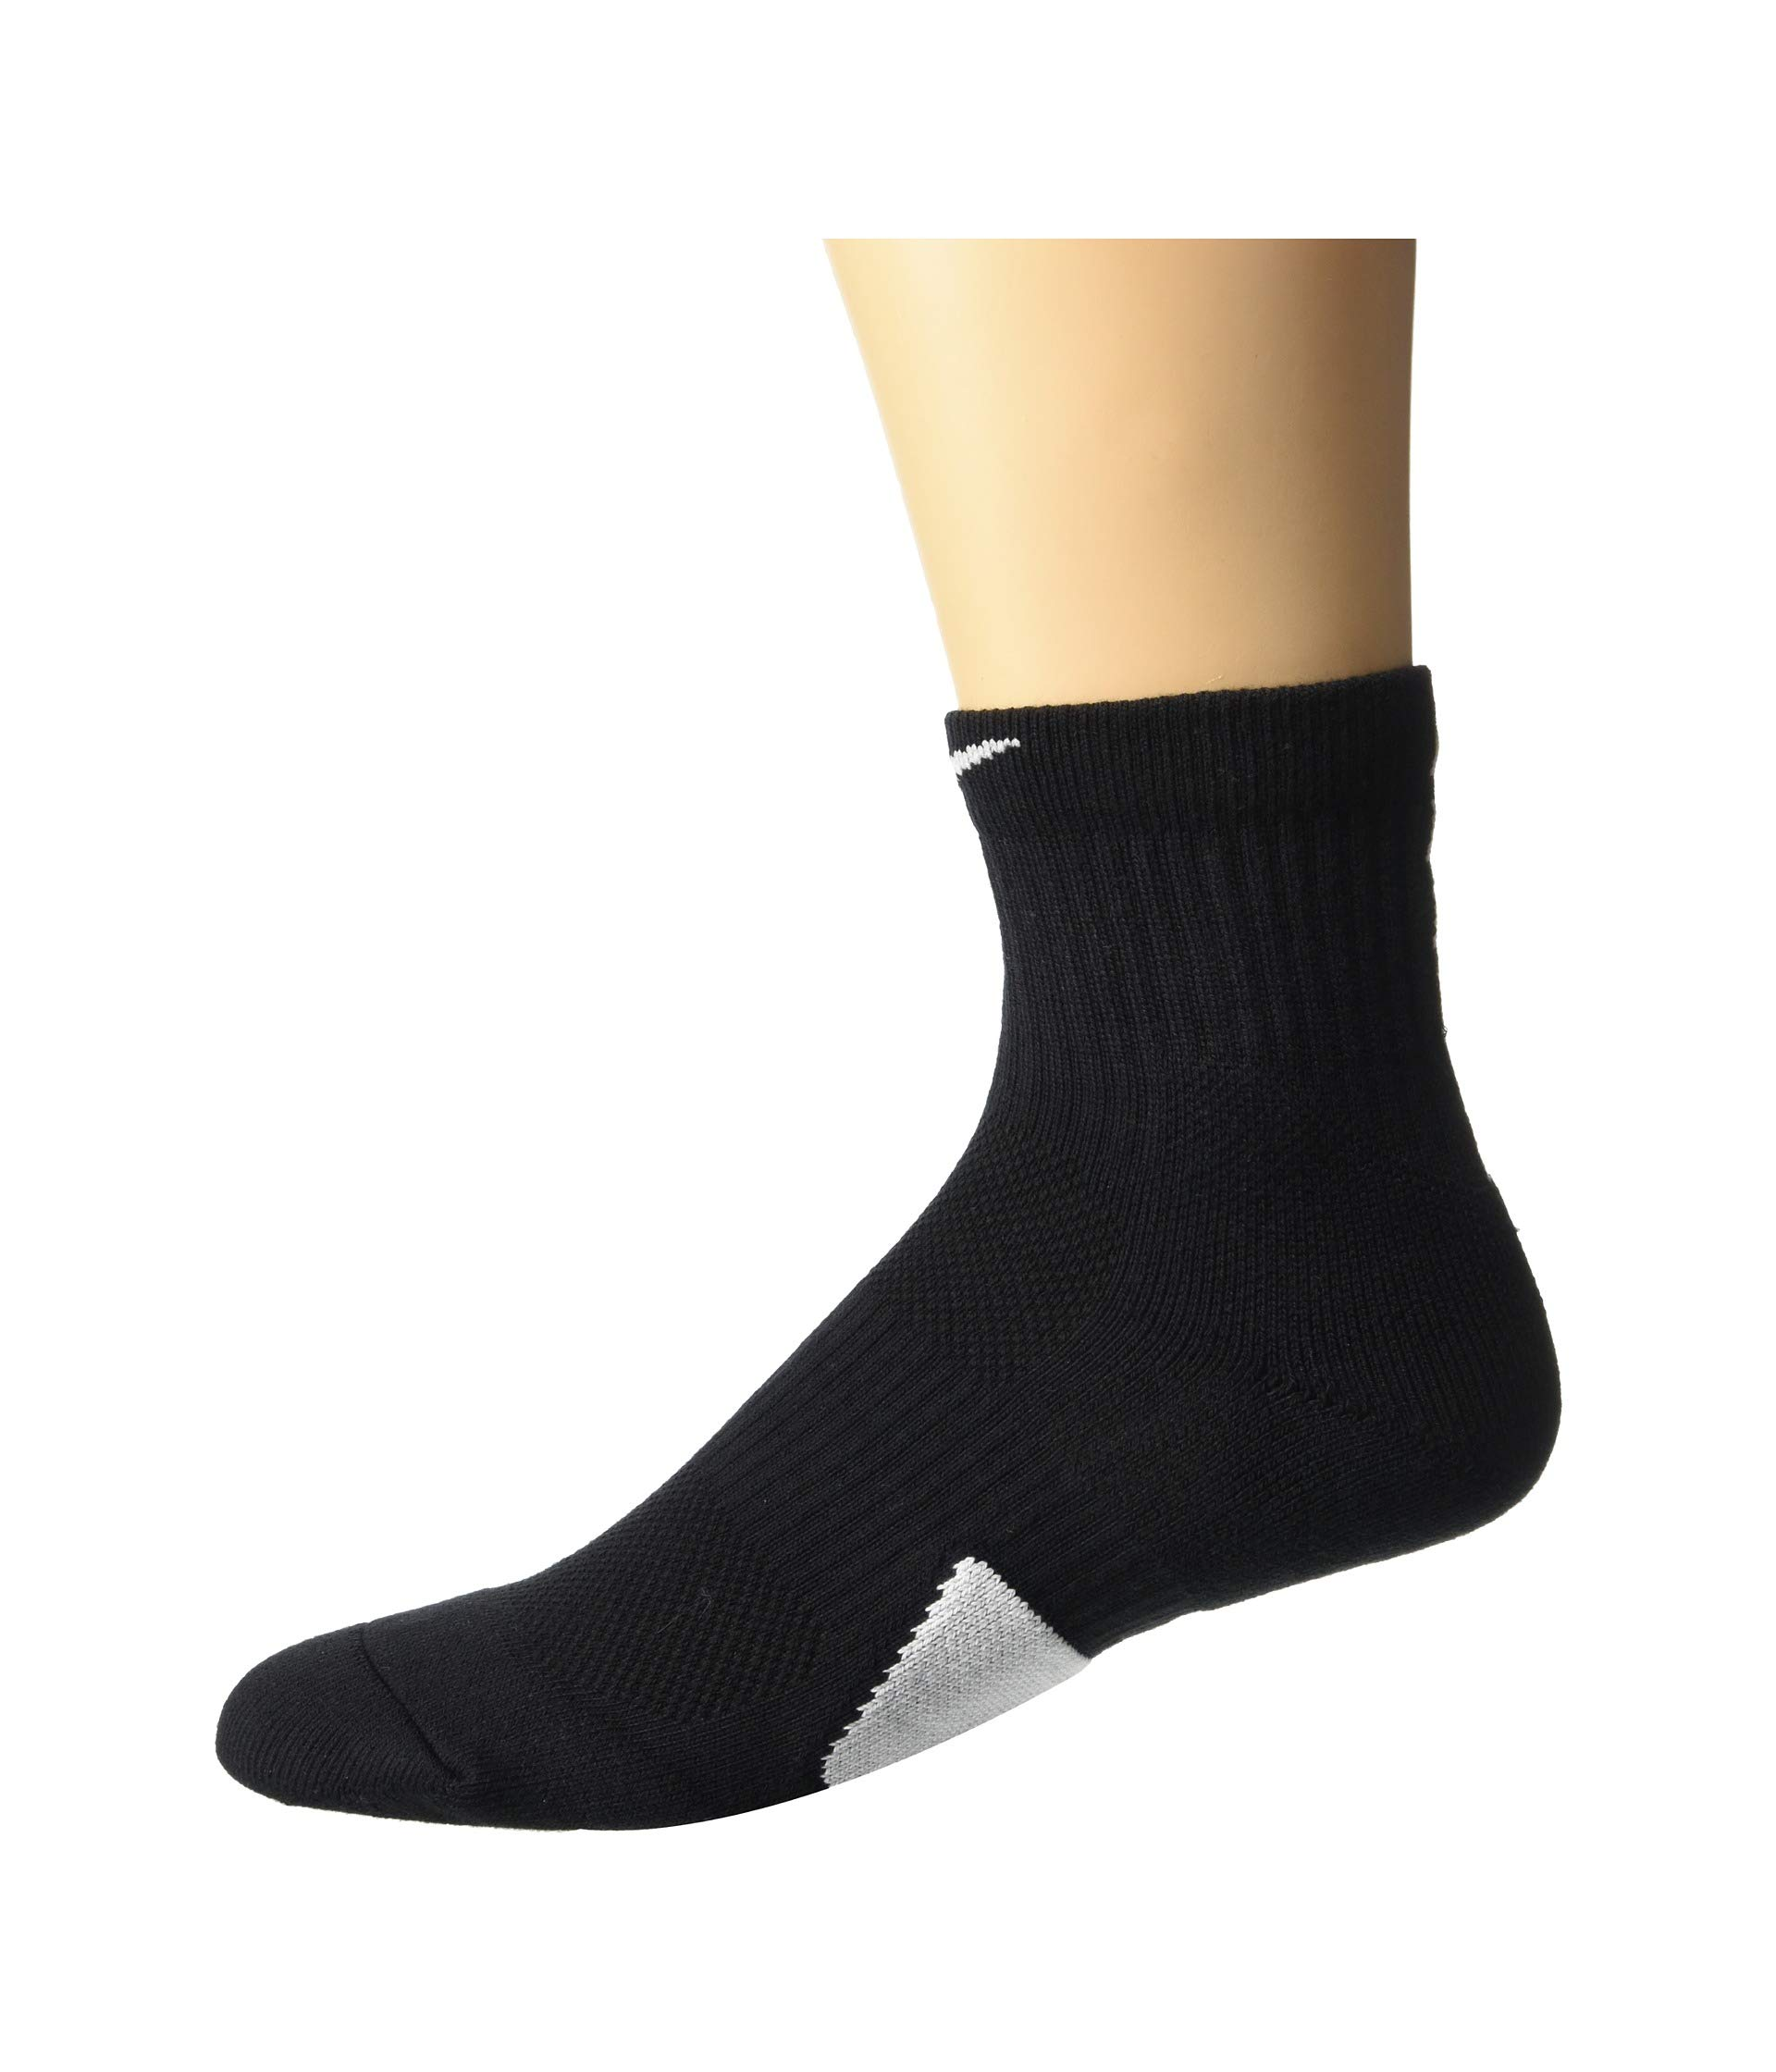 white Nike Basketball Elite white Mid Socks Black TwSPBq